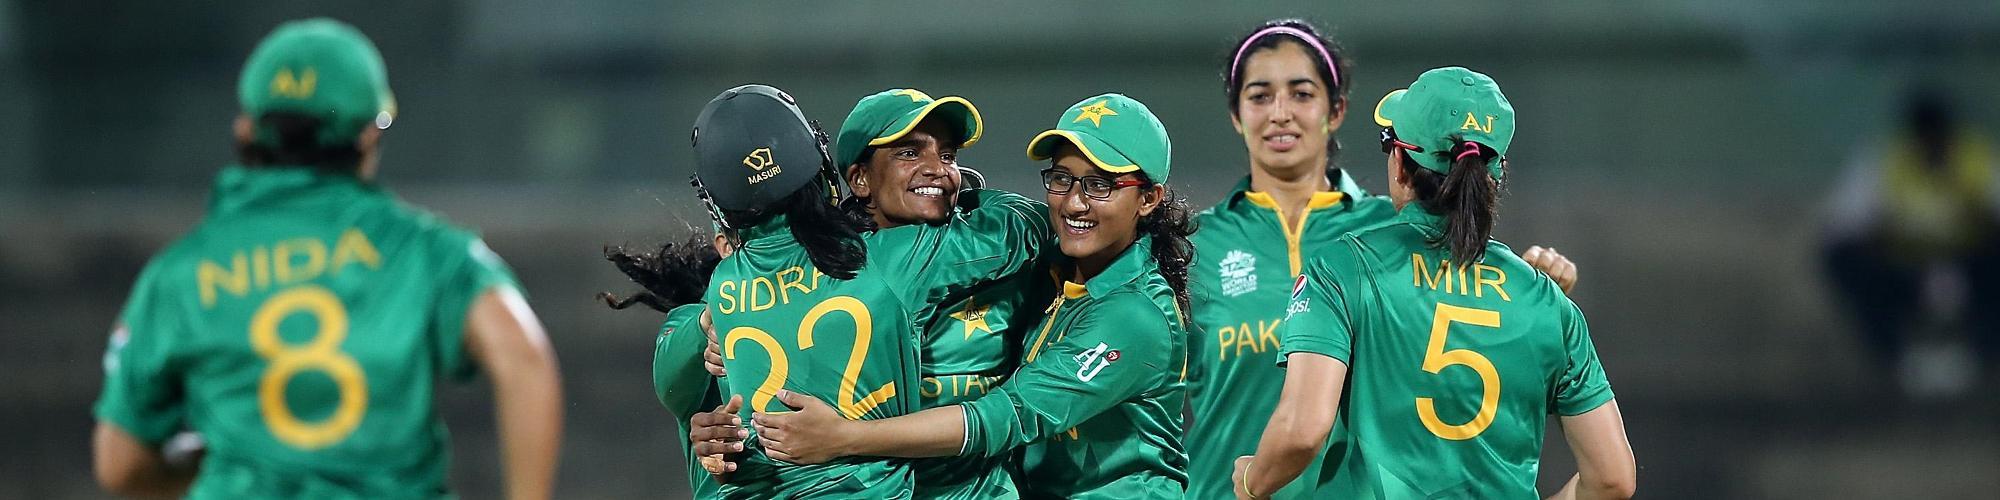 PAK Women Team